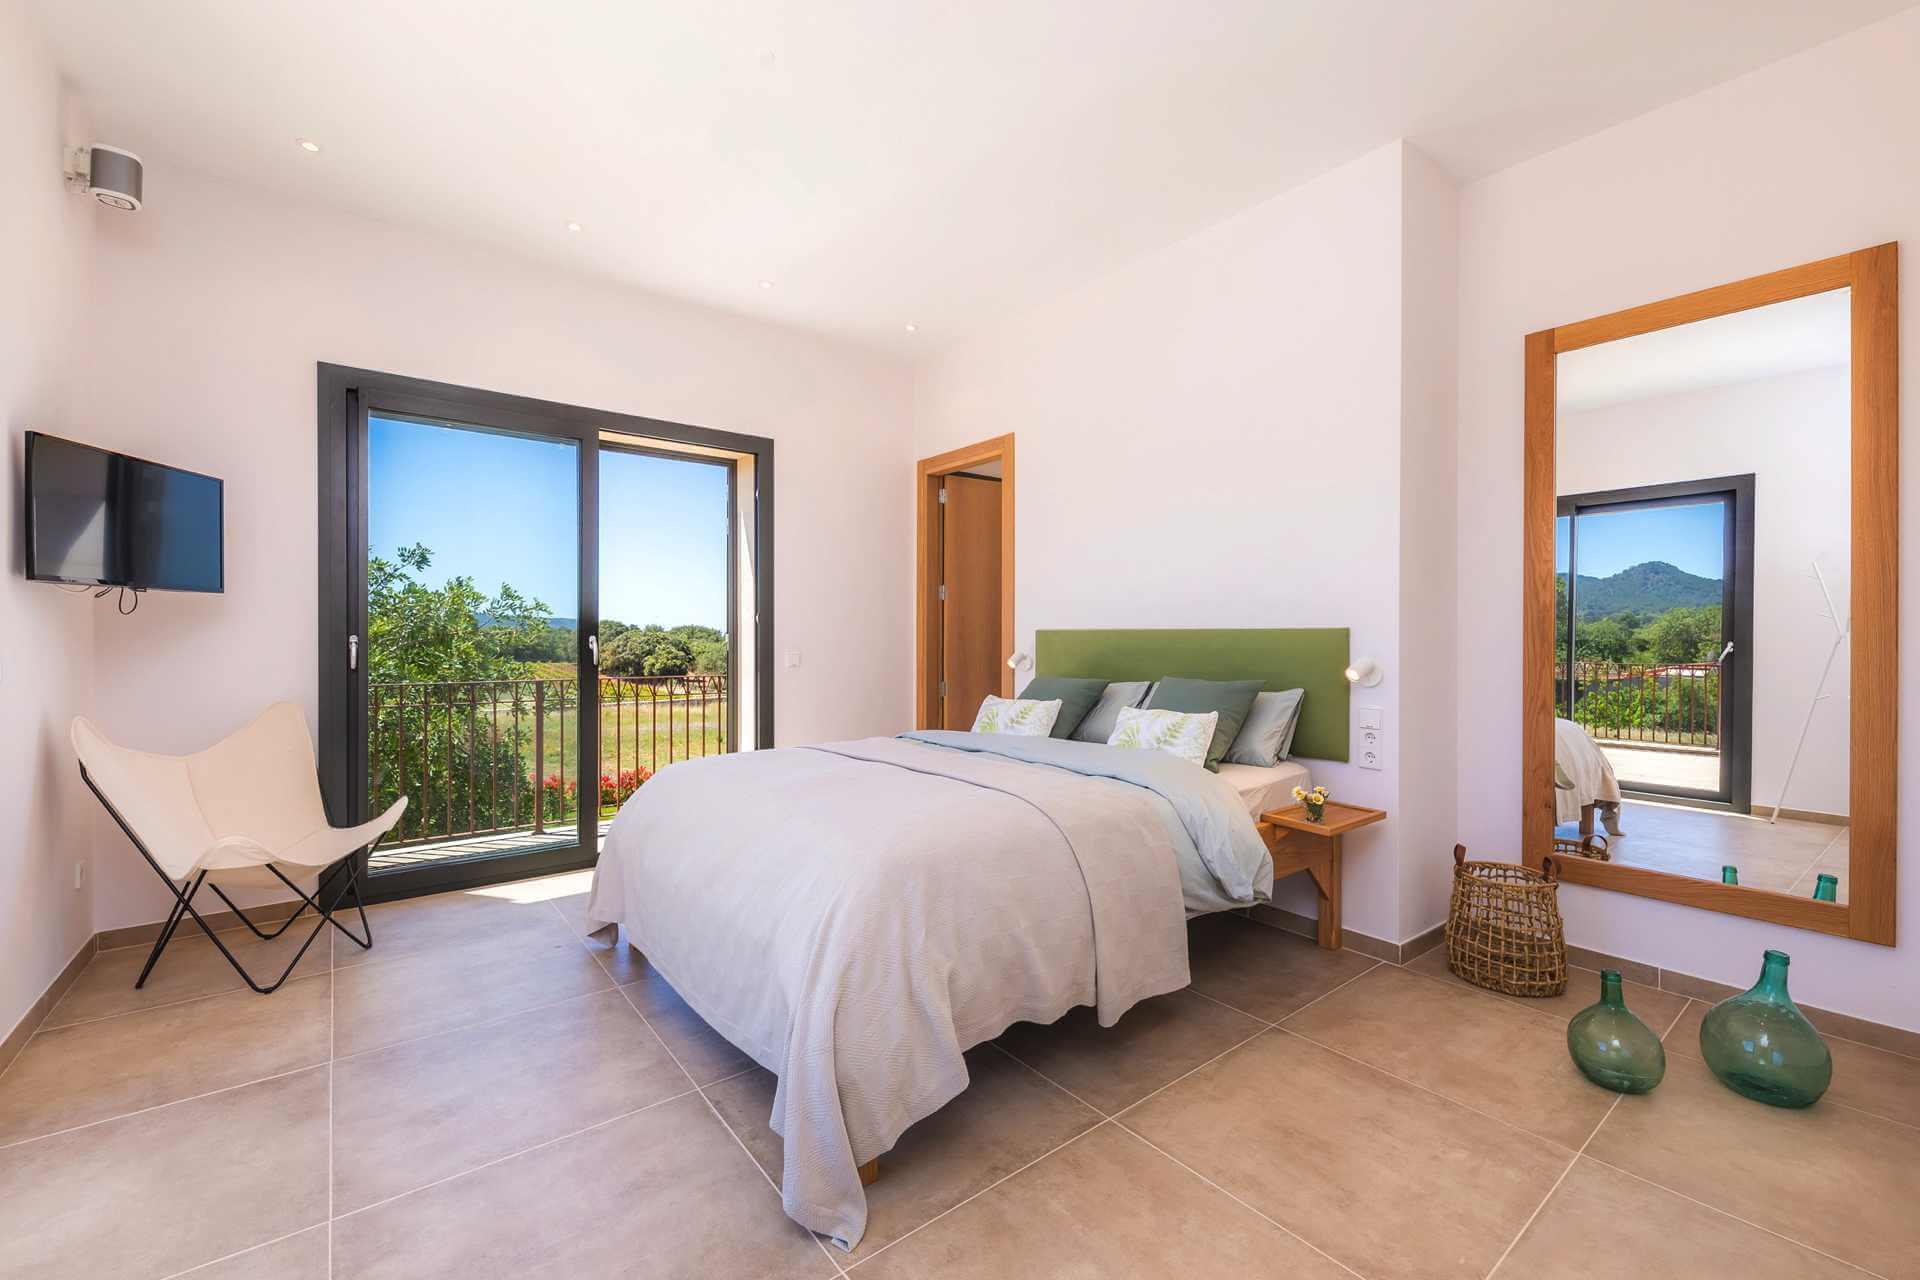 01-340 luxurious Finca Mallorca East Bild 26